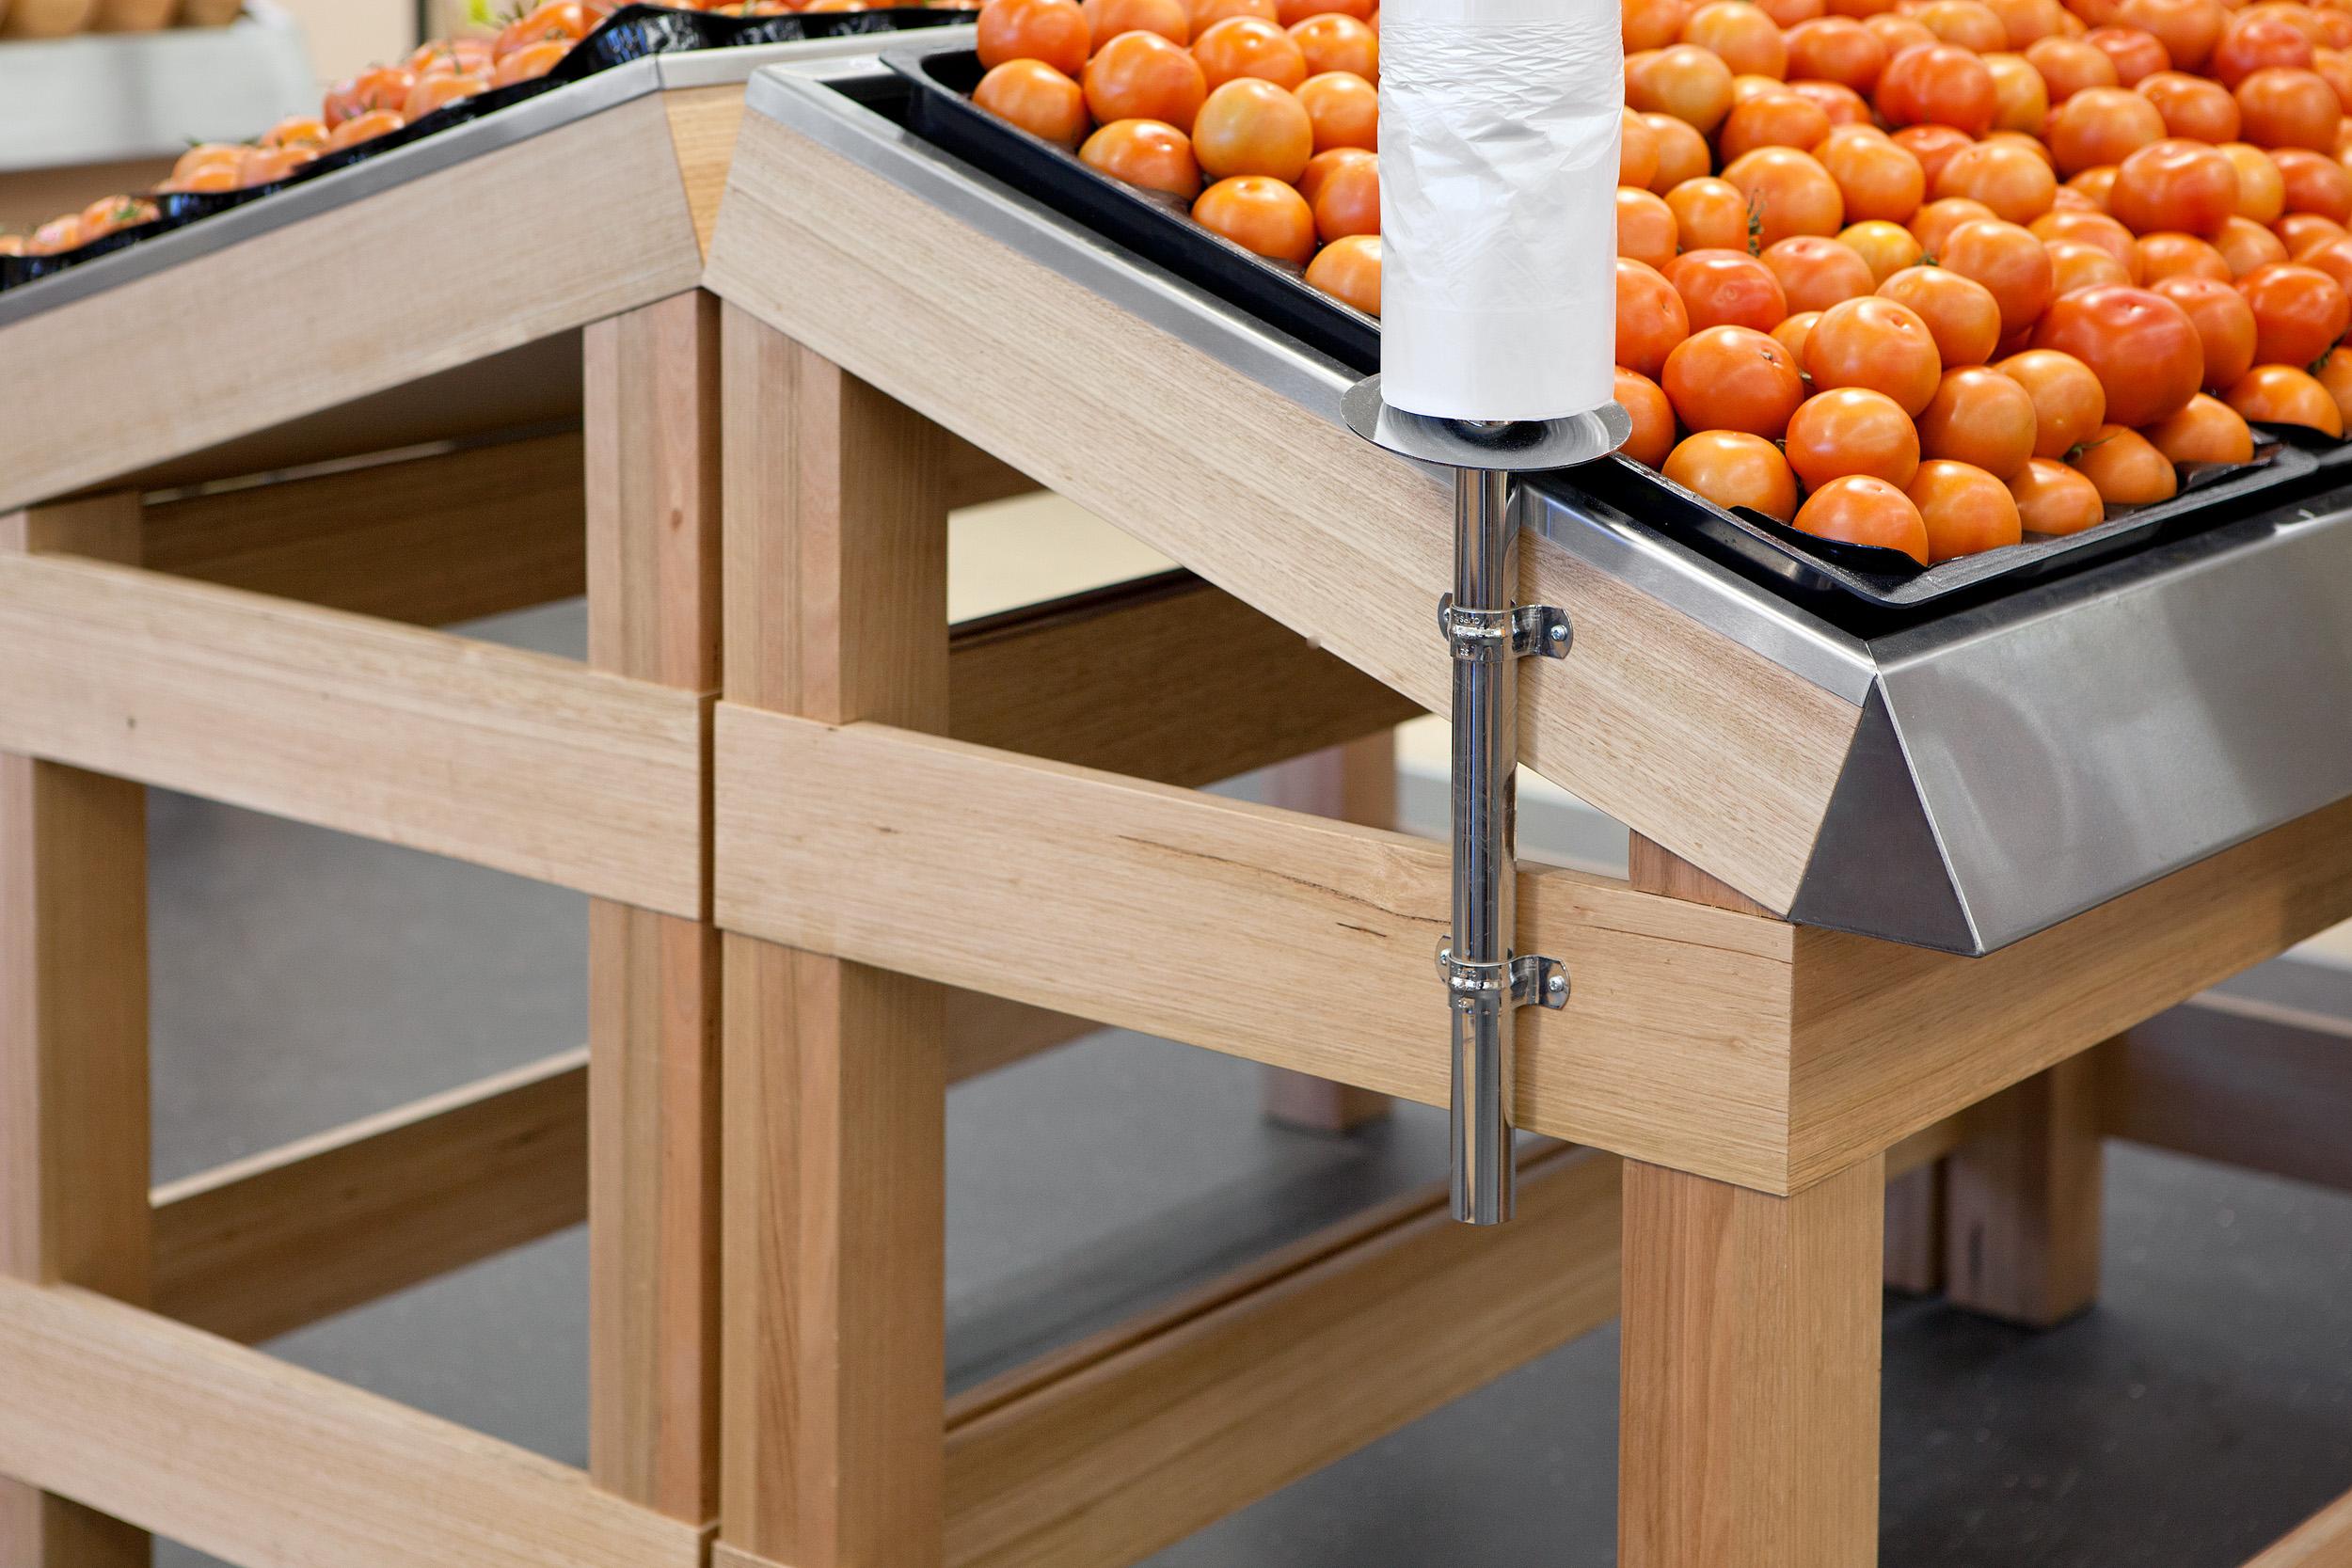 foodland fruit bins 2.jpg